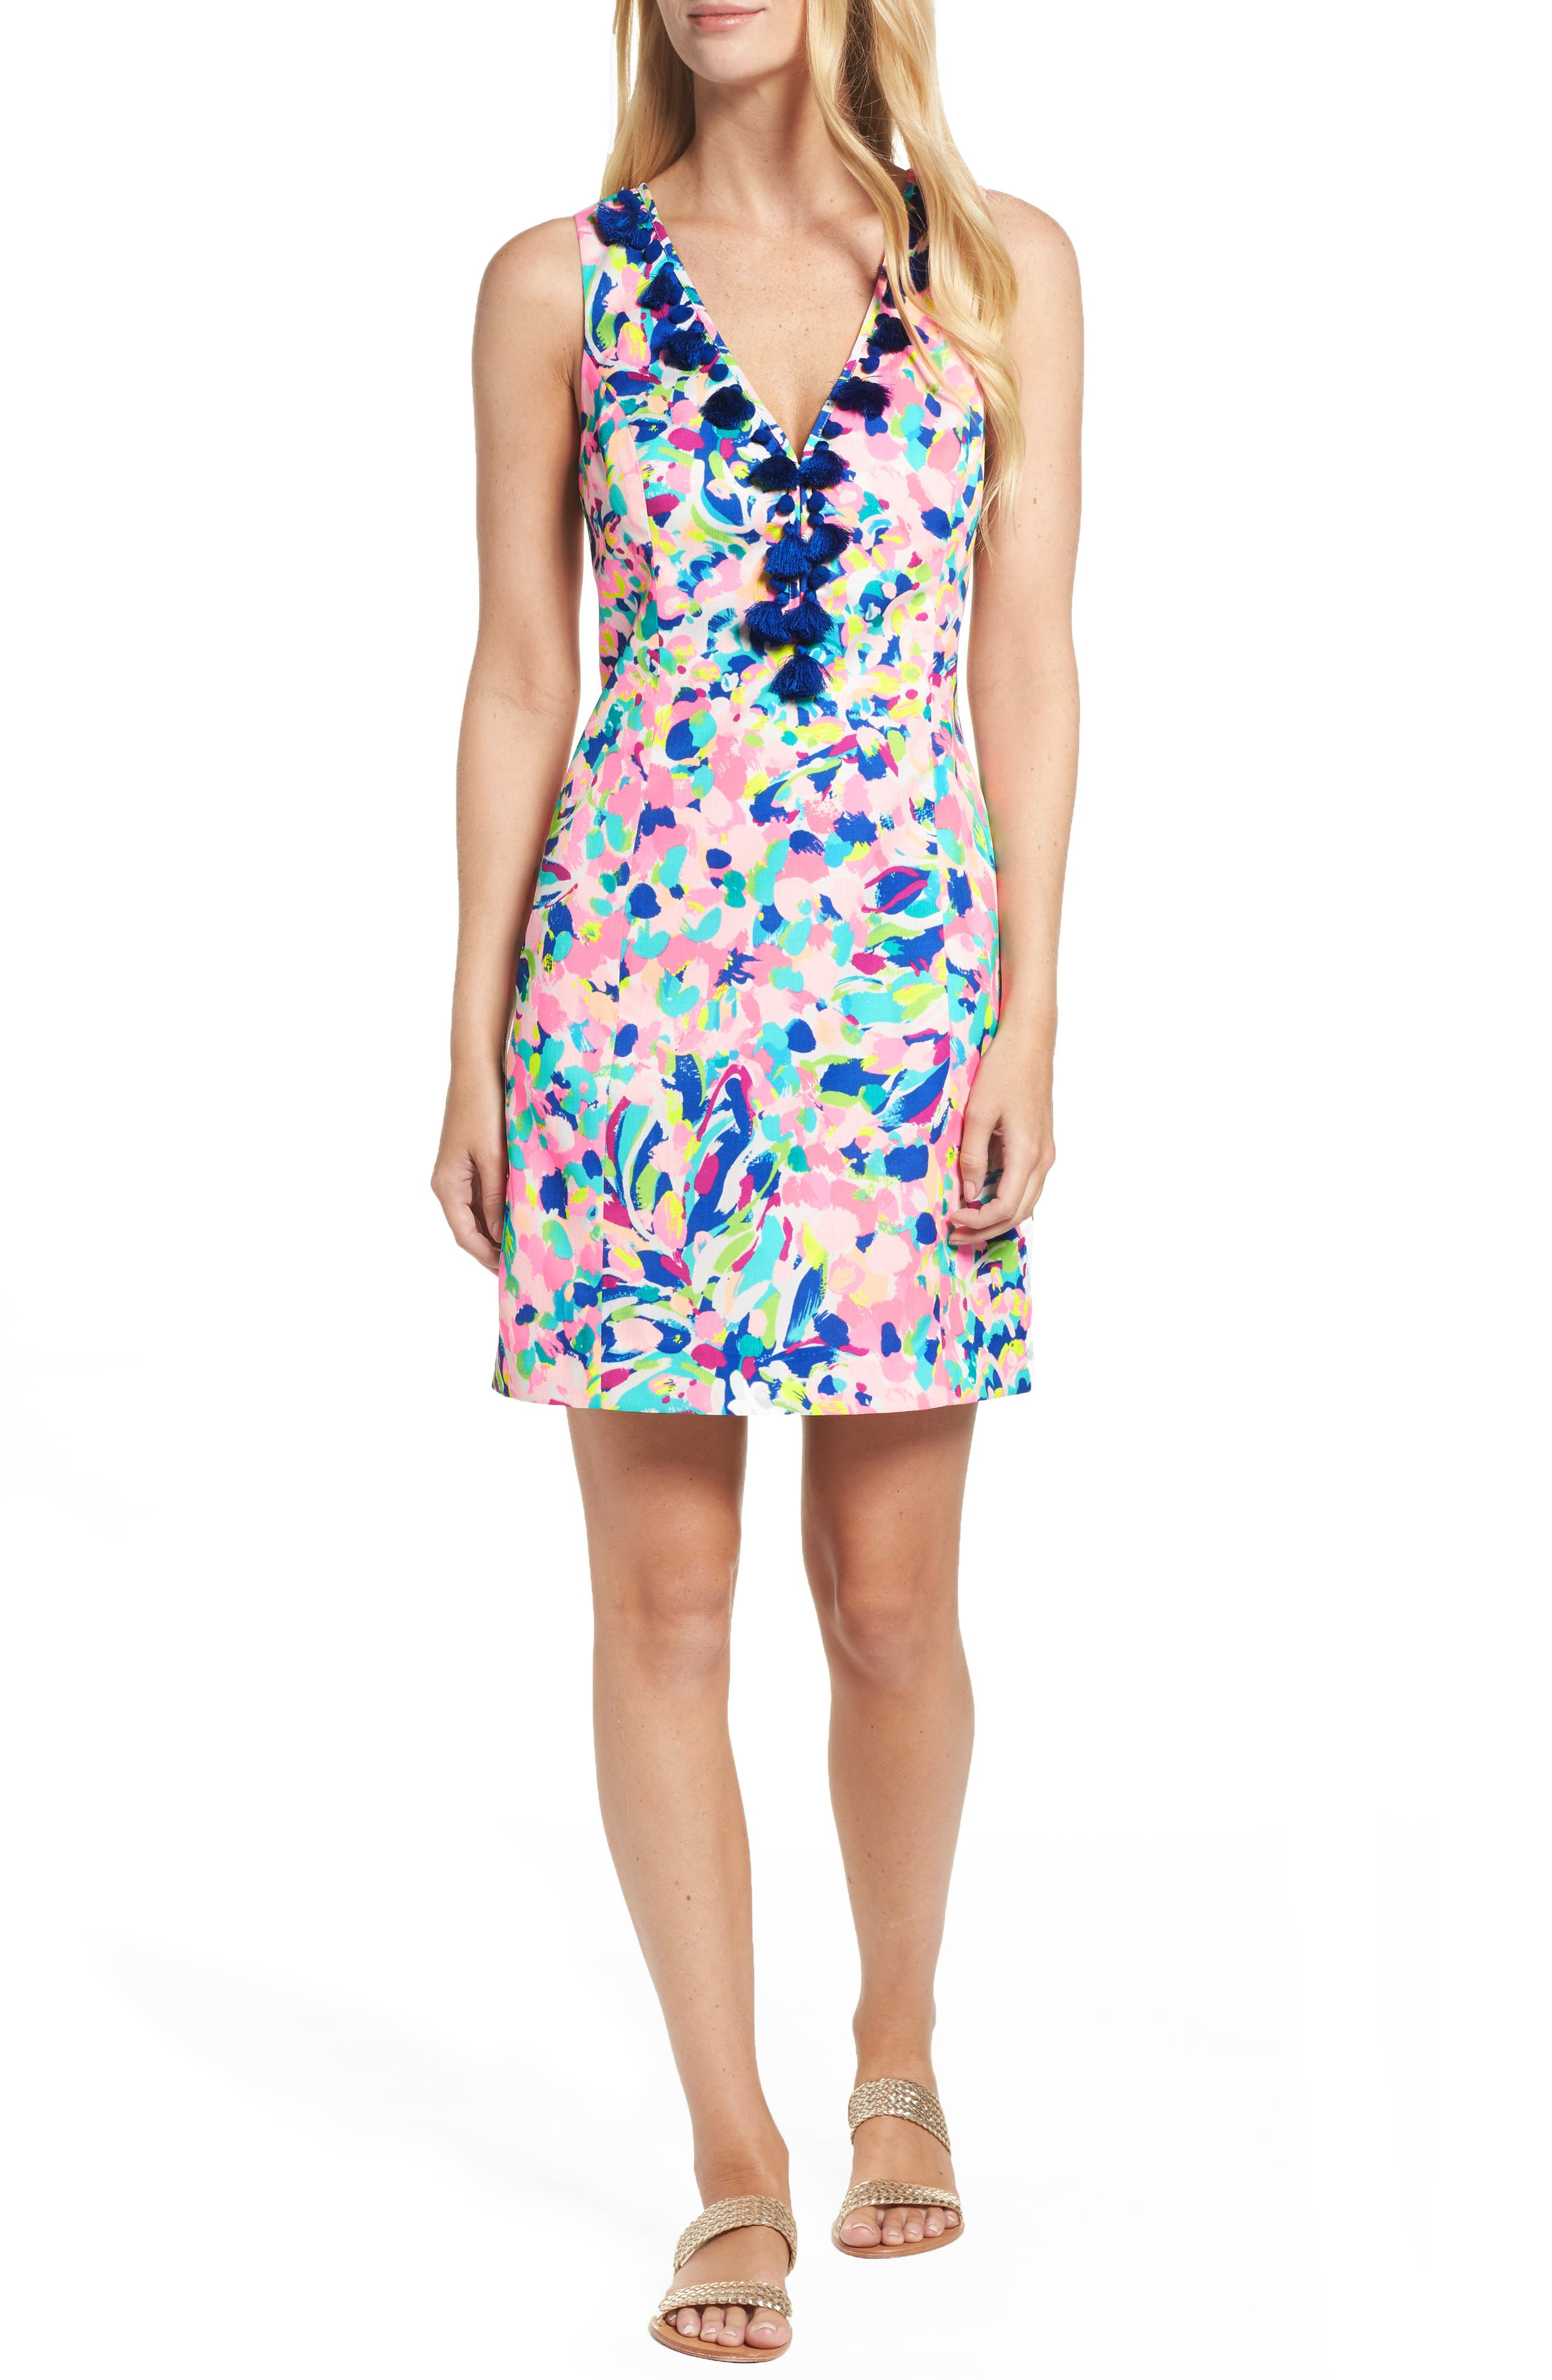 Cabrey Sheath Dress,                         Main,                         color, Multi Pina Colada Club